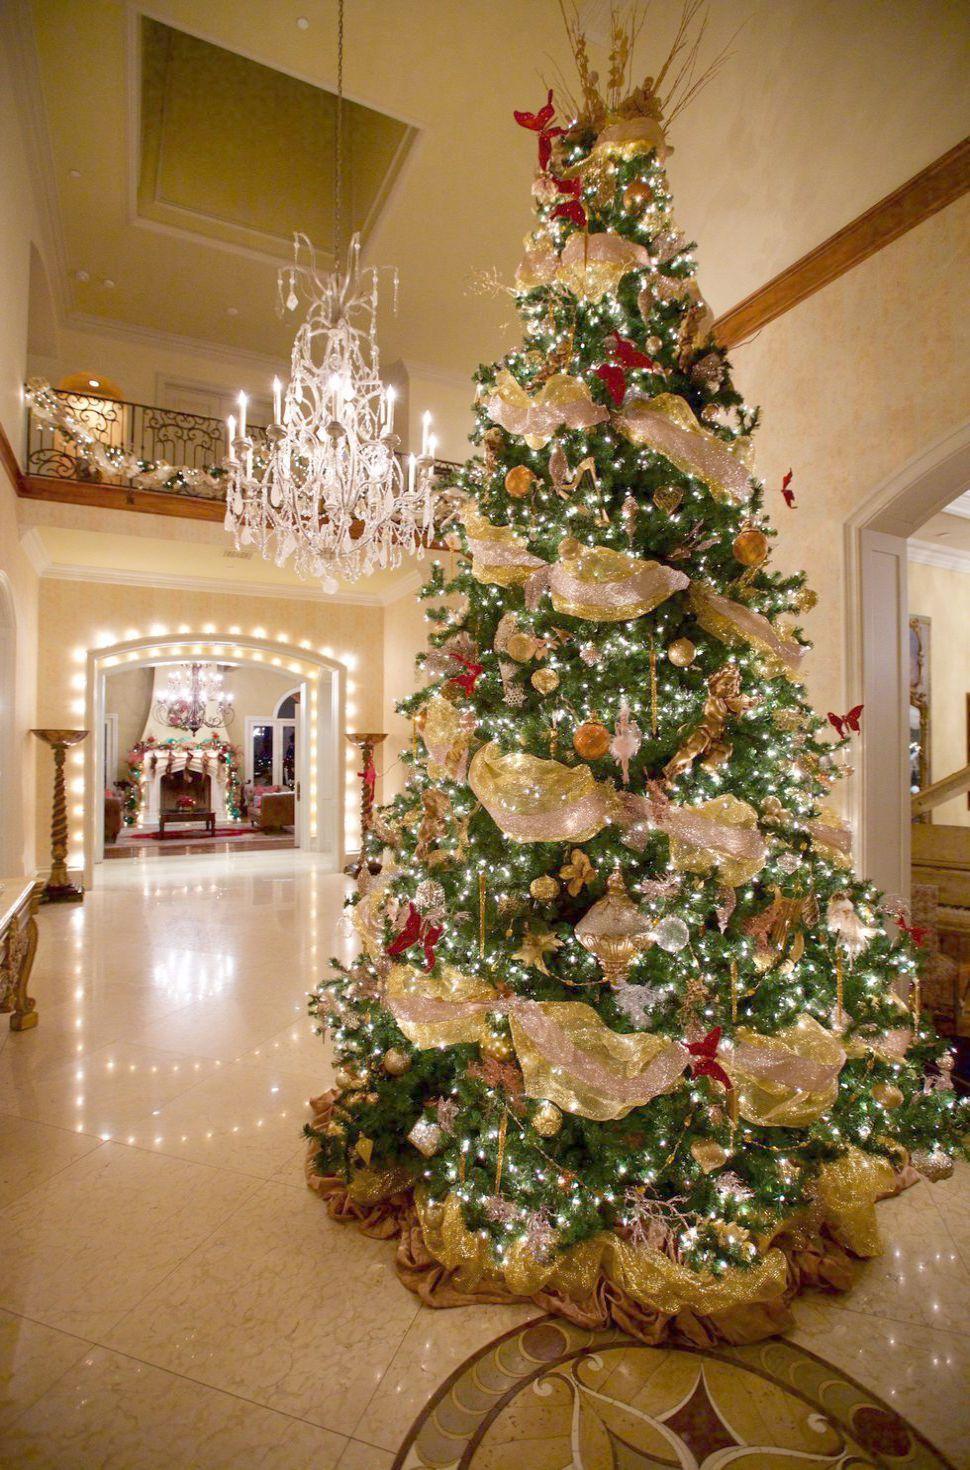 Christmas 2019 London Shows While Christmas Tree Bag Lowes Canada Better Ch Elegant Christmas Trees Best Christmas Tree Decorations Gold Christmas Decorations